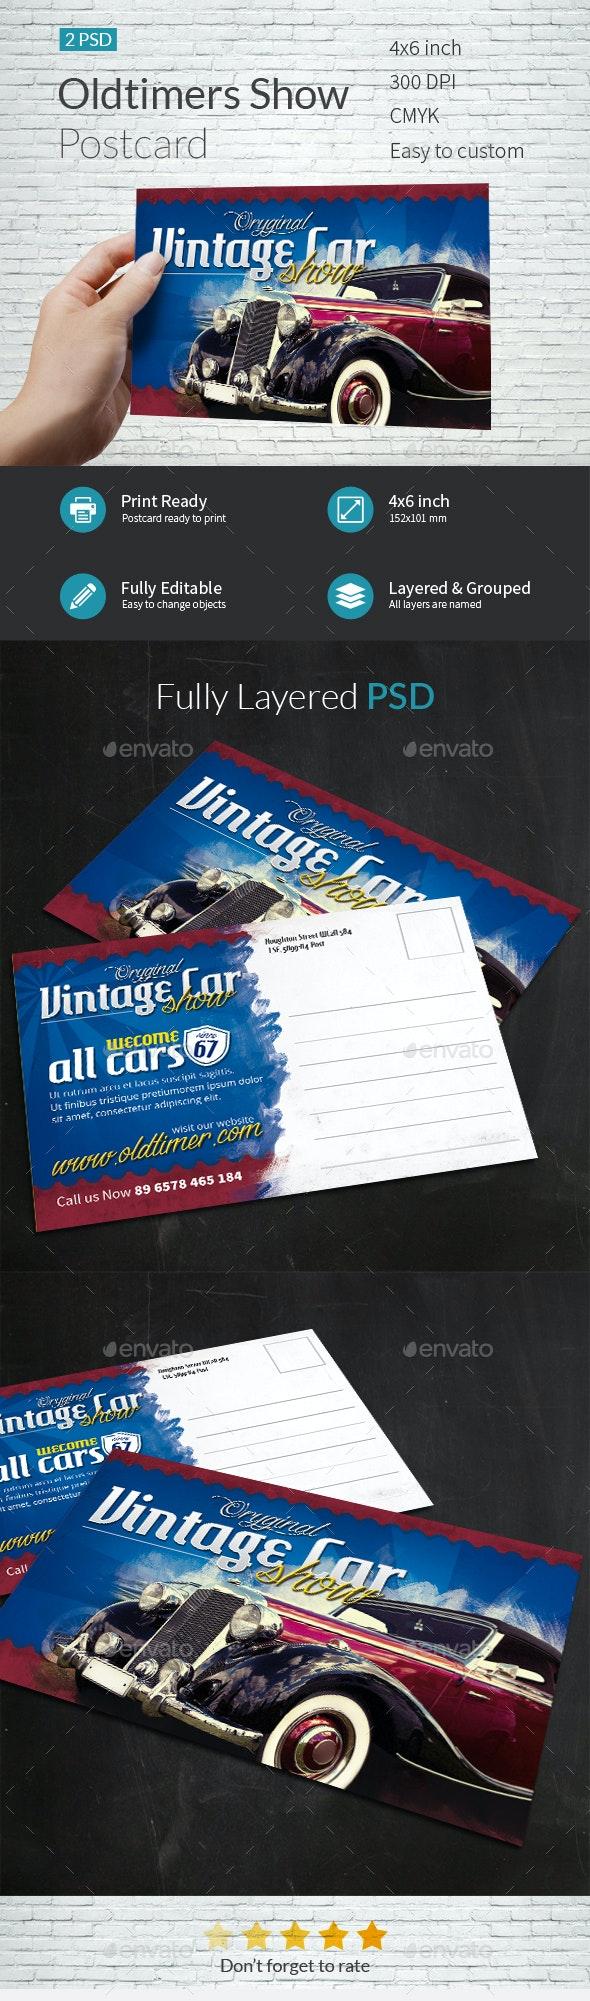 Vintage Cars Event Postcard Template - Cards & Invites Print Templates